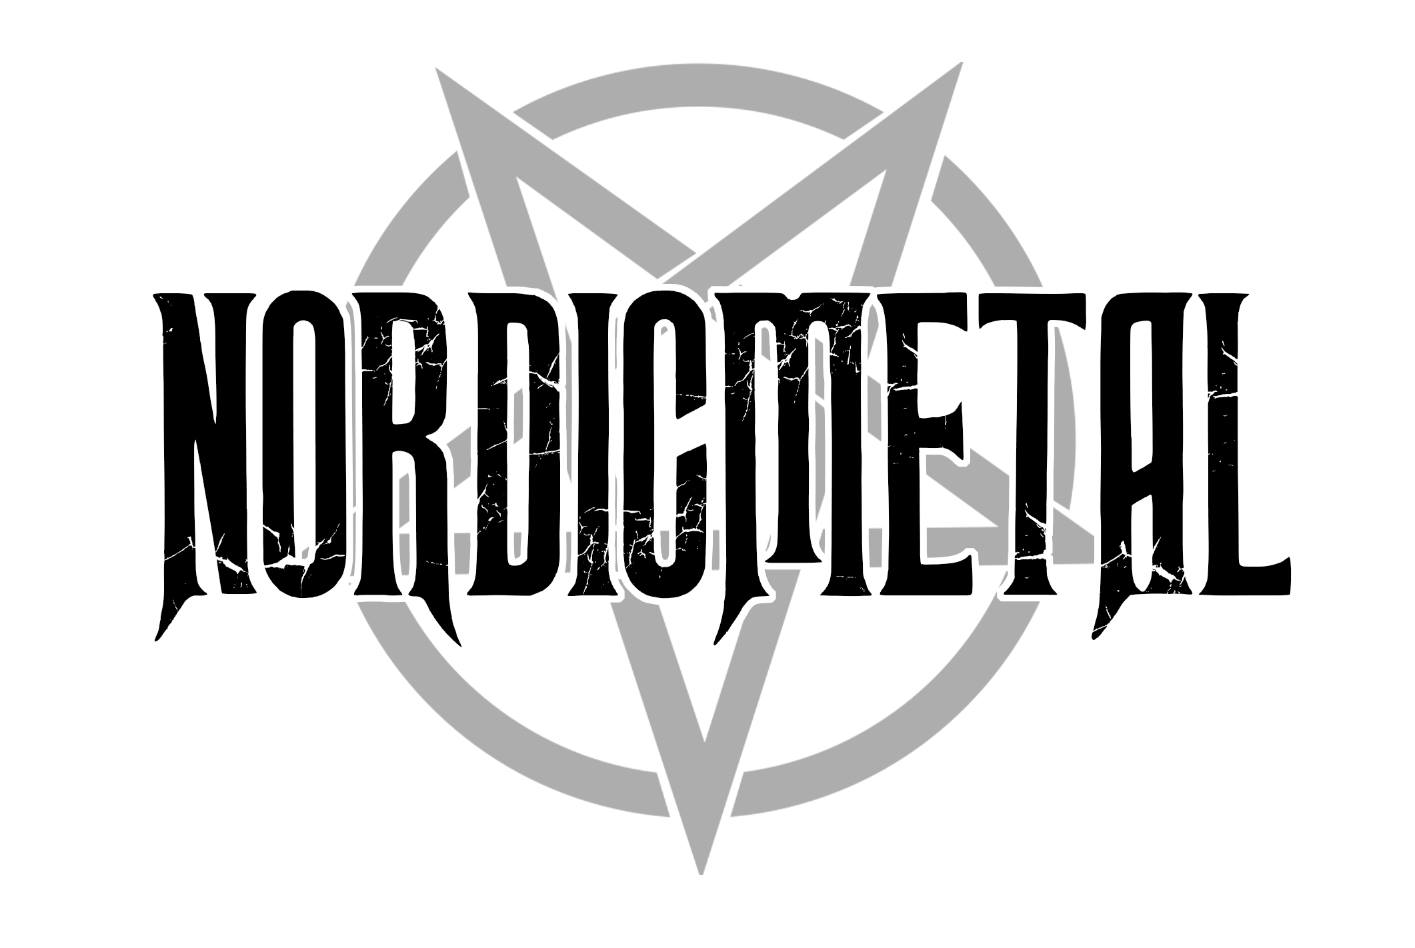 Nordic Metal Music